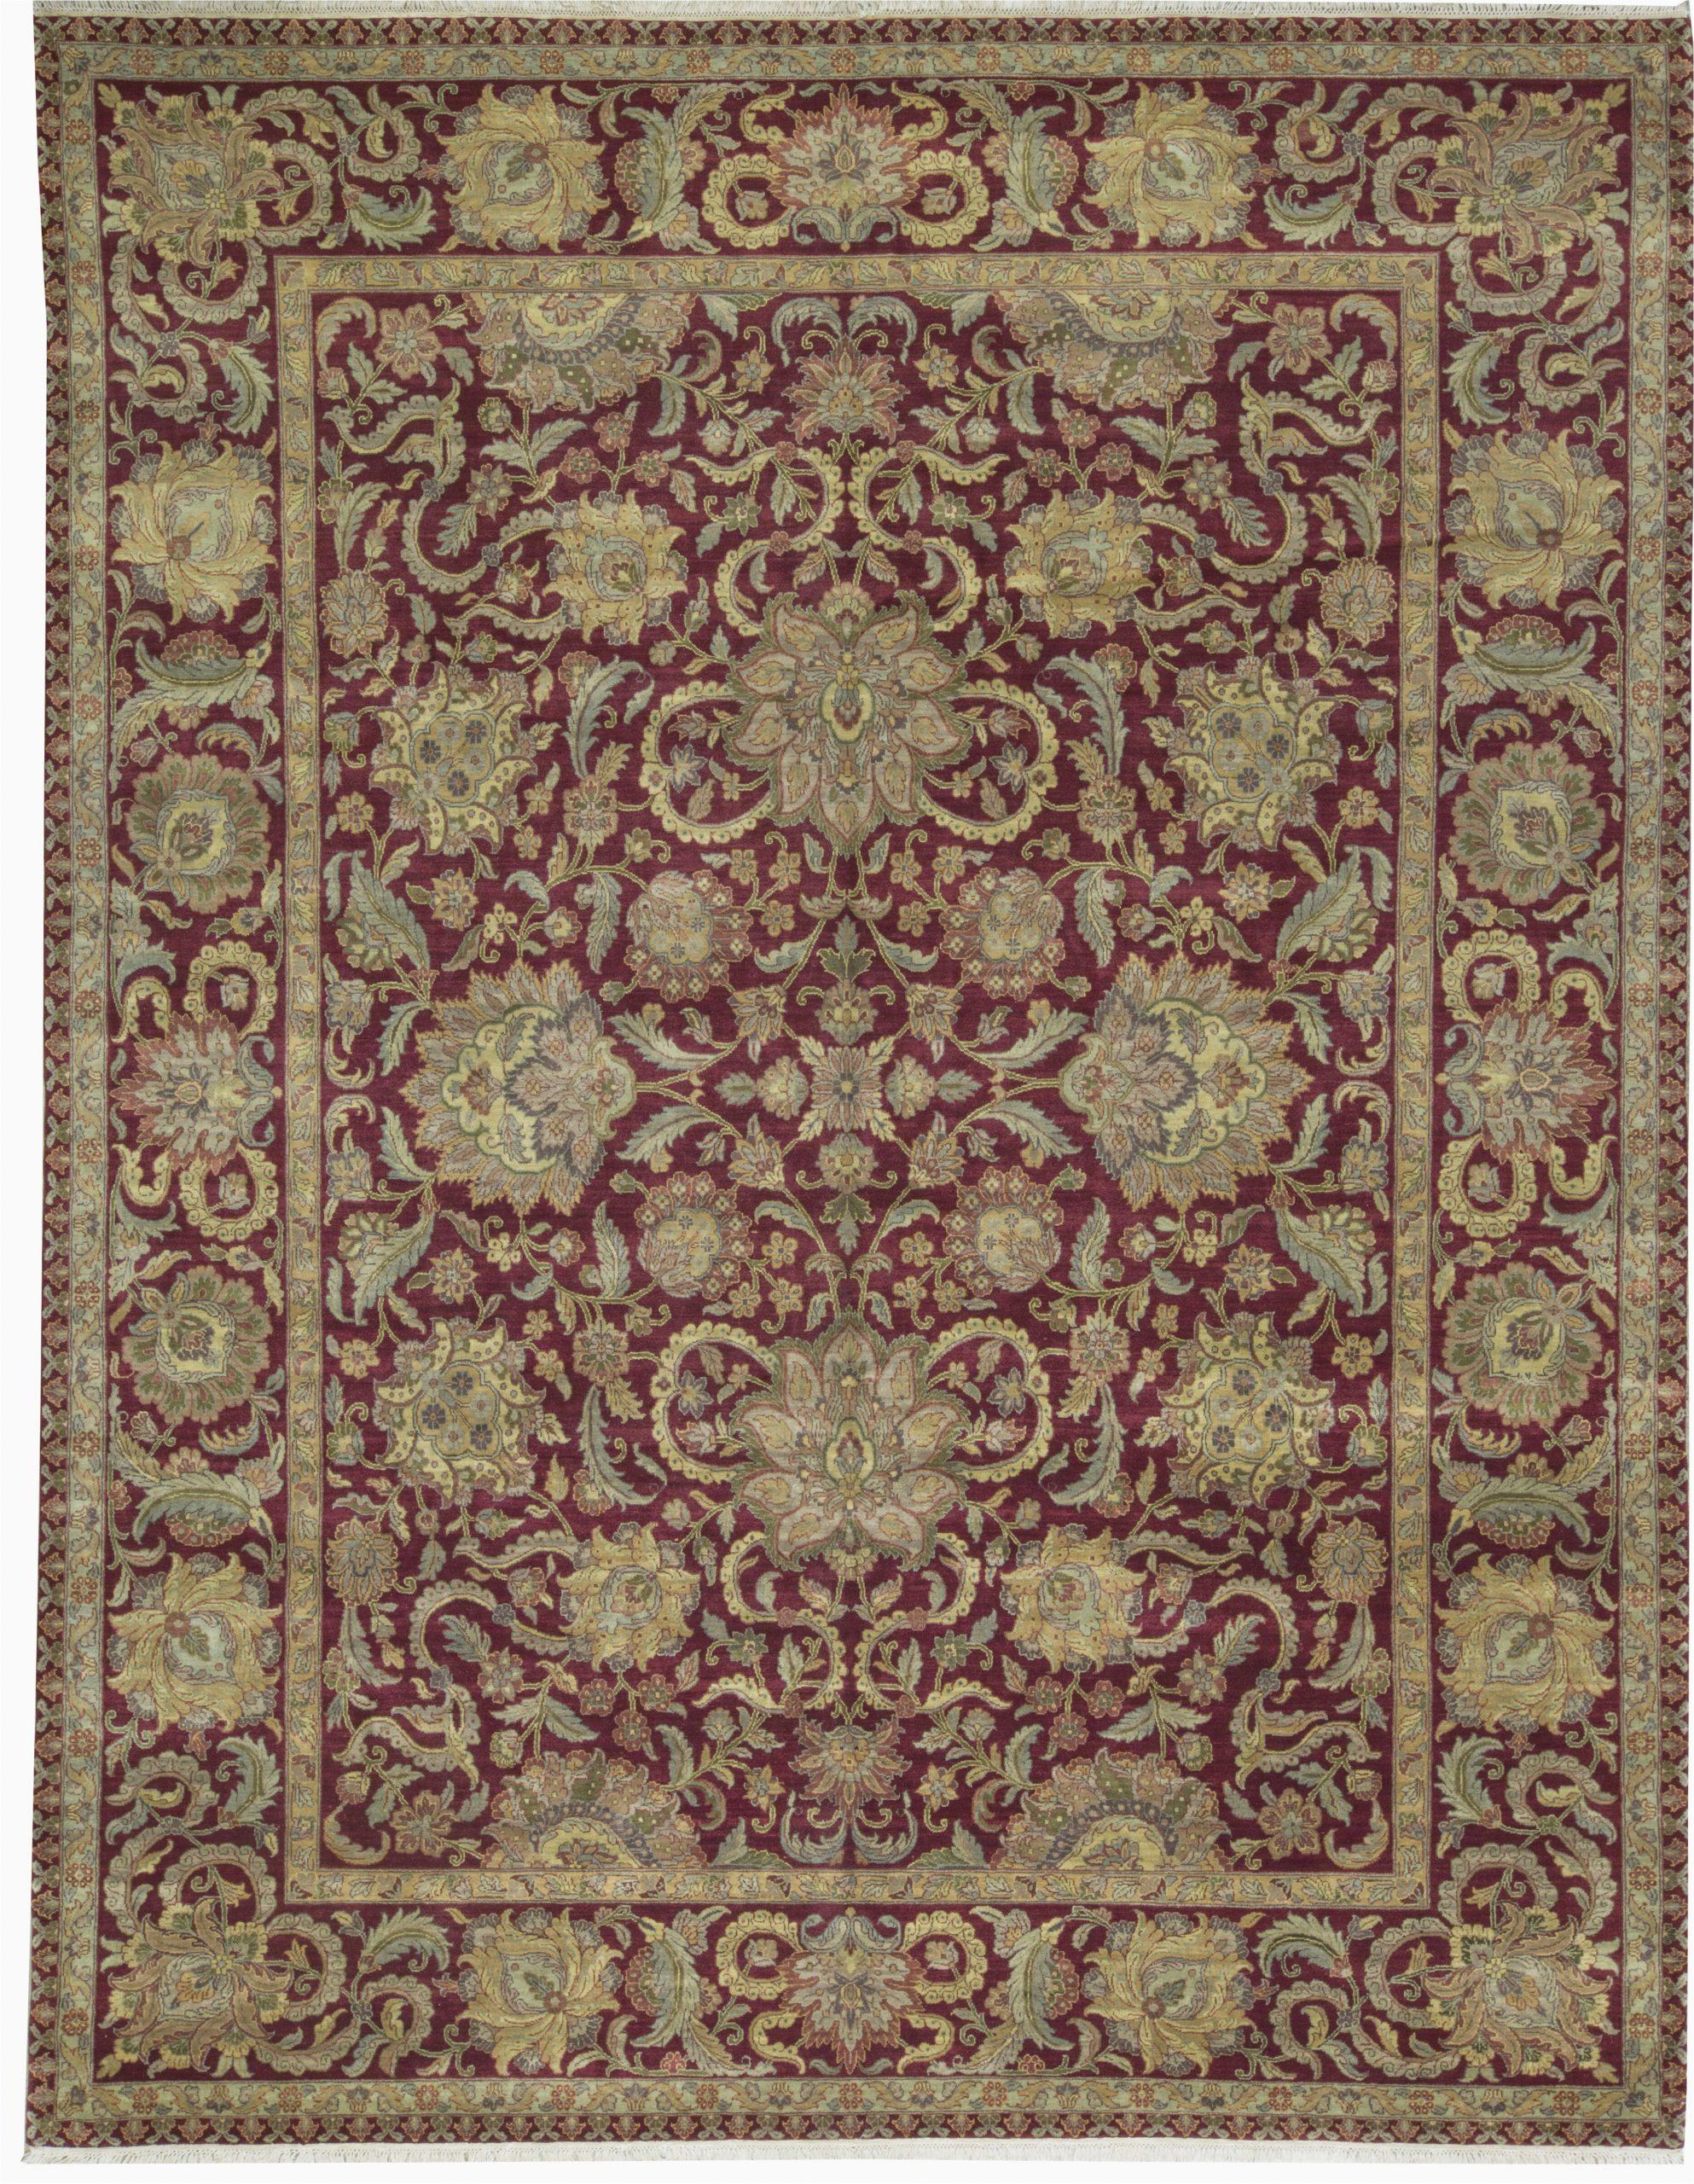 bokara rug co inc one of a kind crown hand knotted redbeige 12 x 157 wool area rug abhd2974